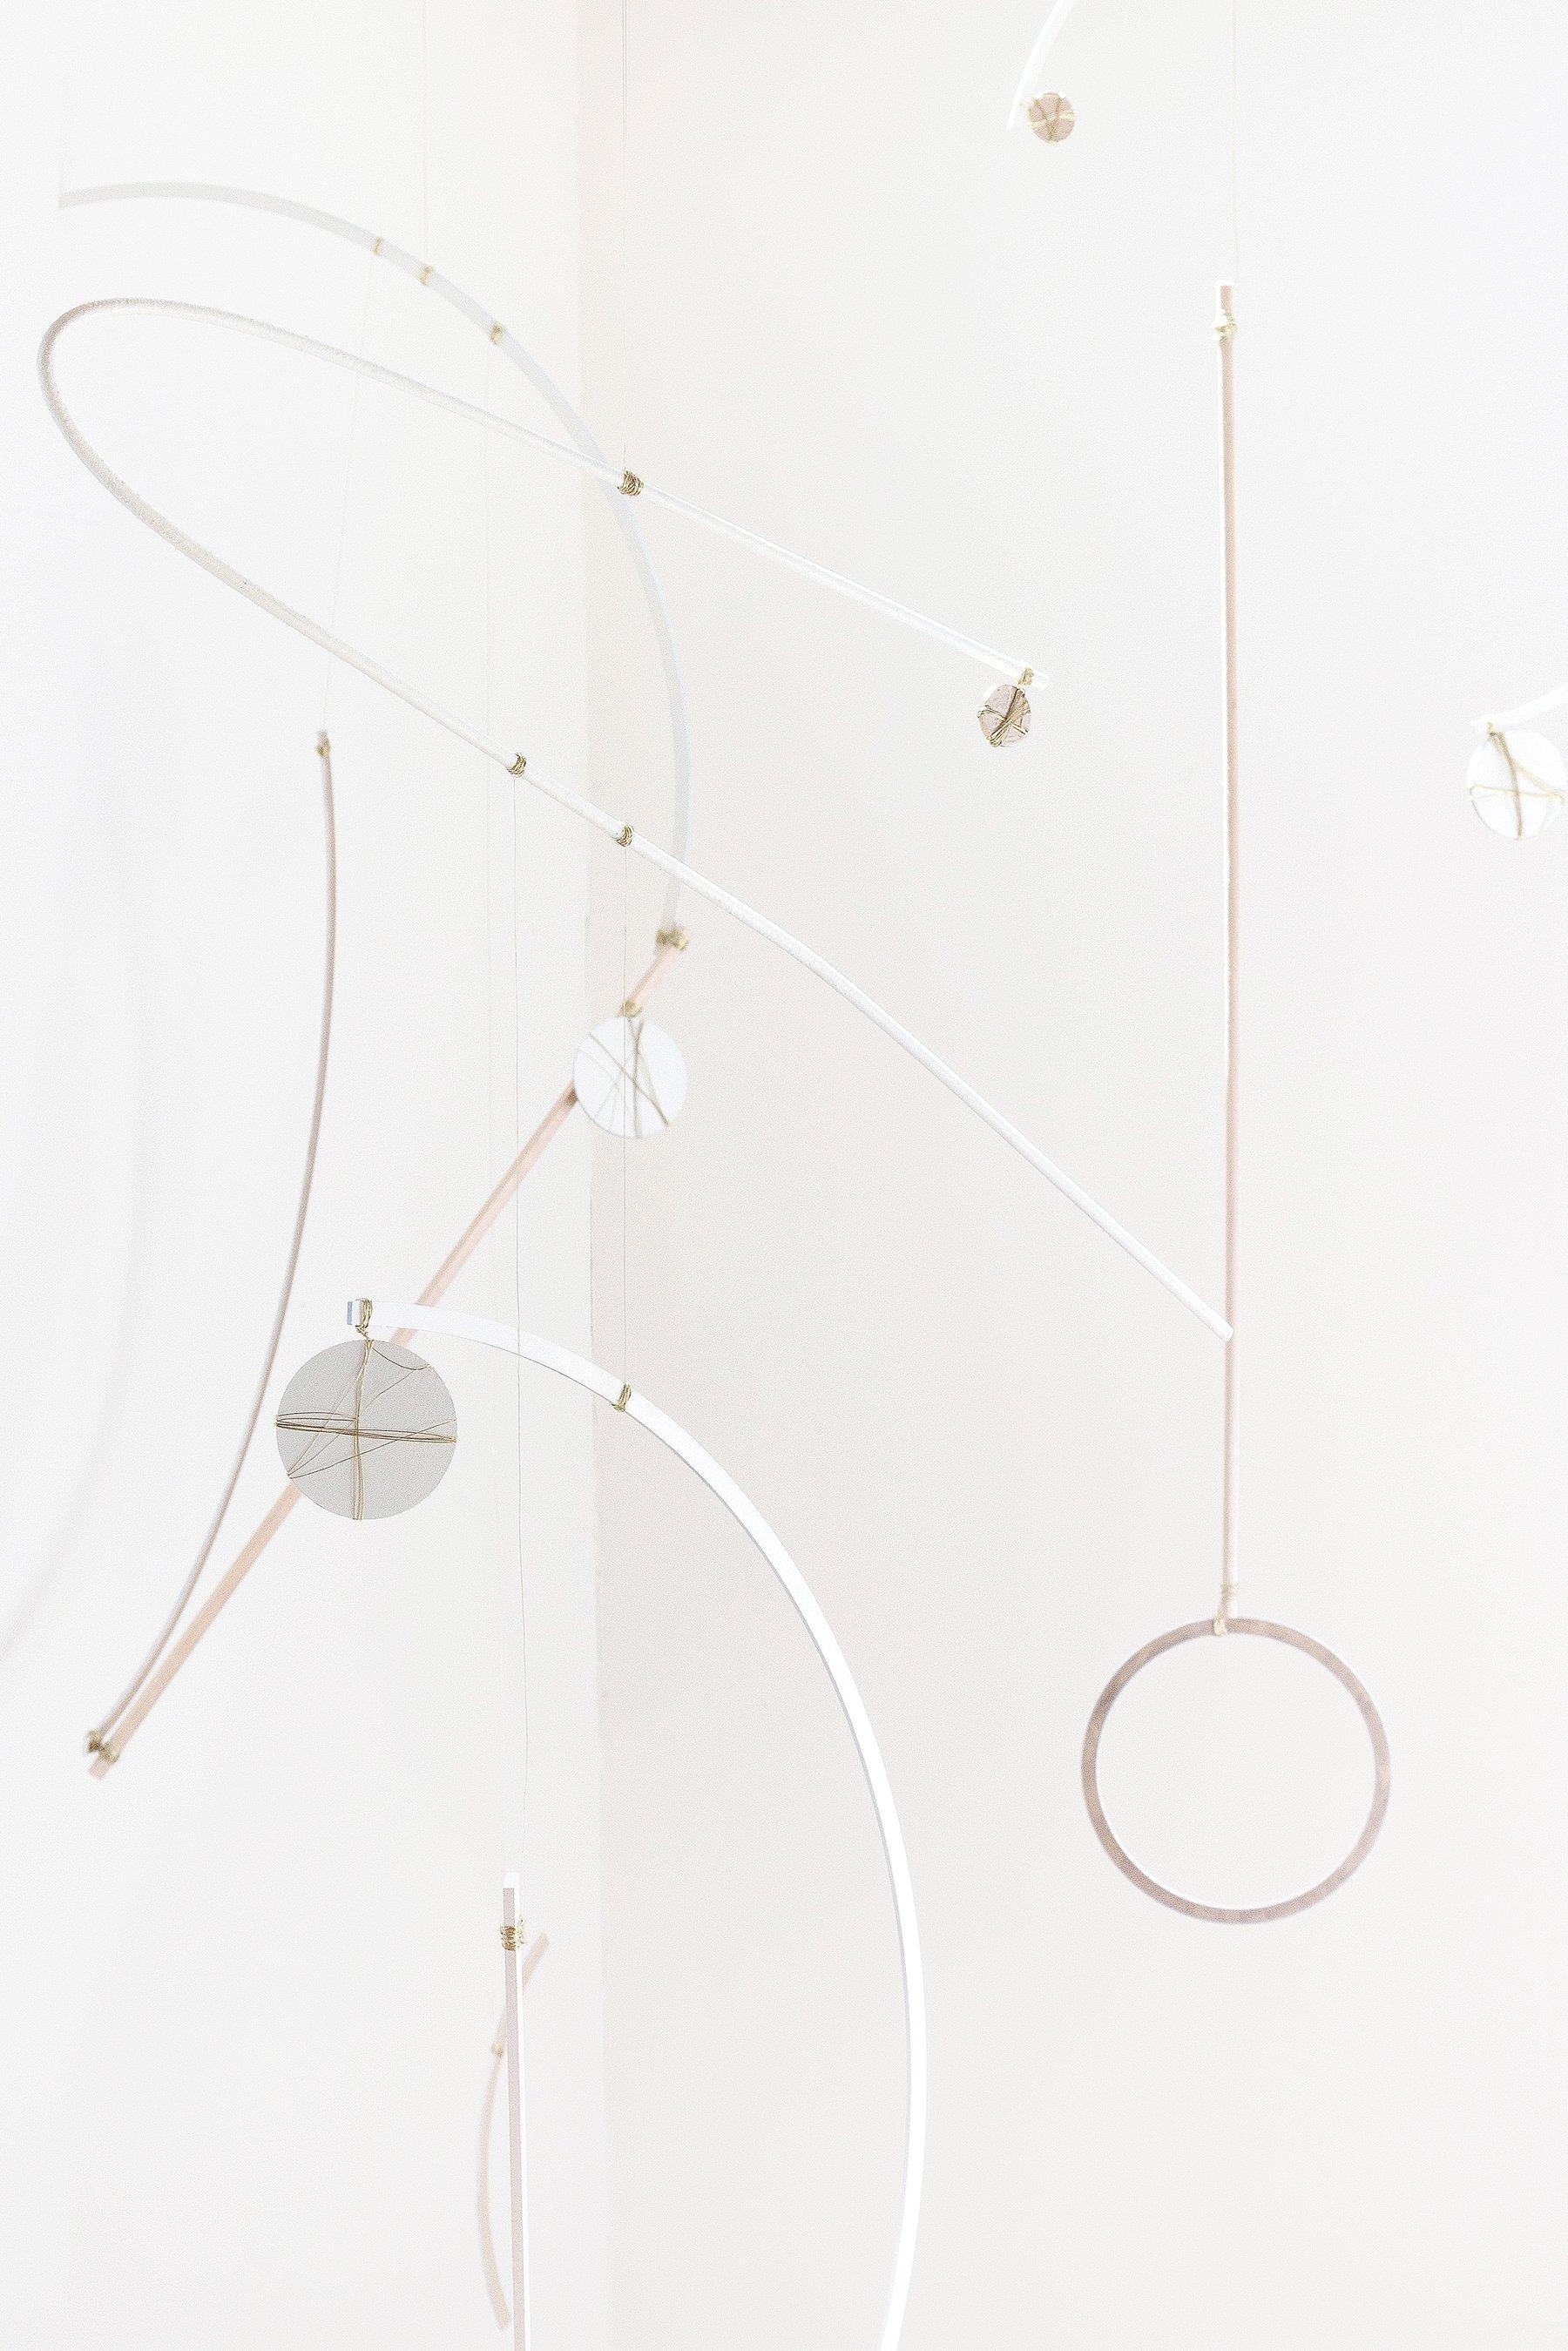 iGNANT-Art-Carla-Cascales-04